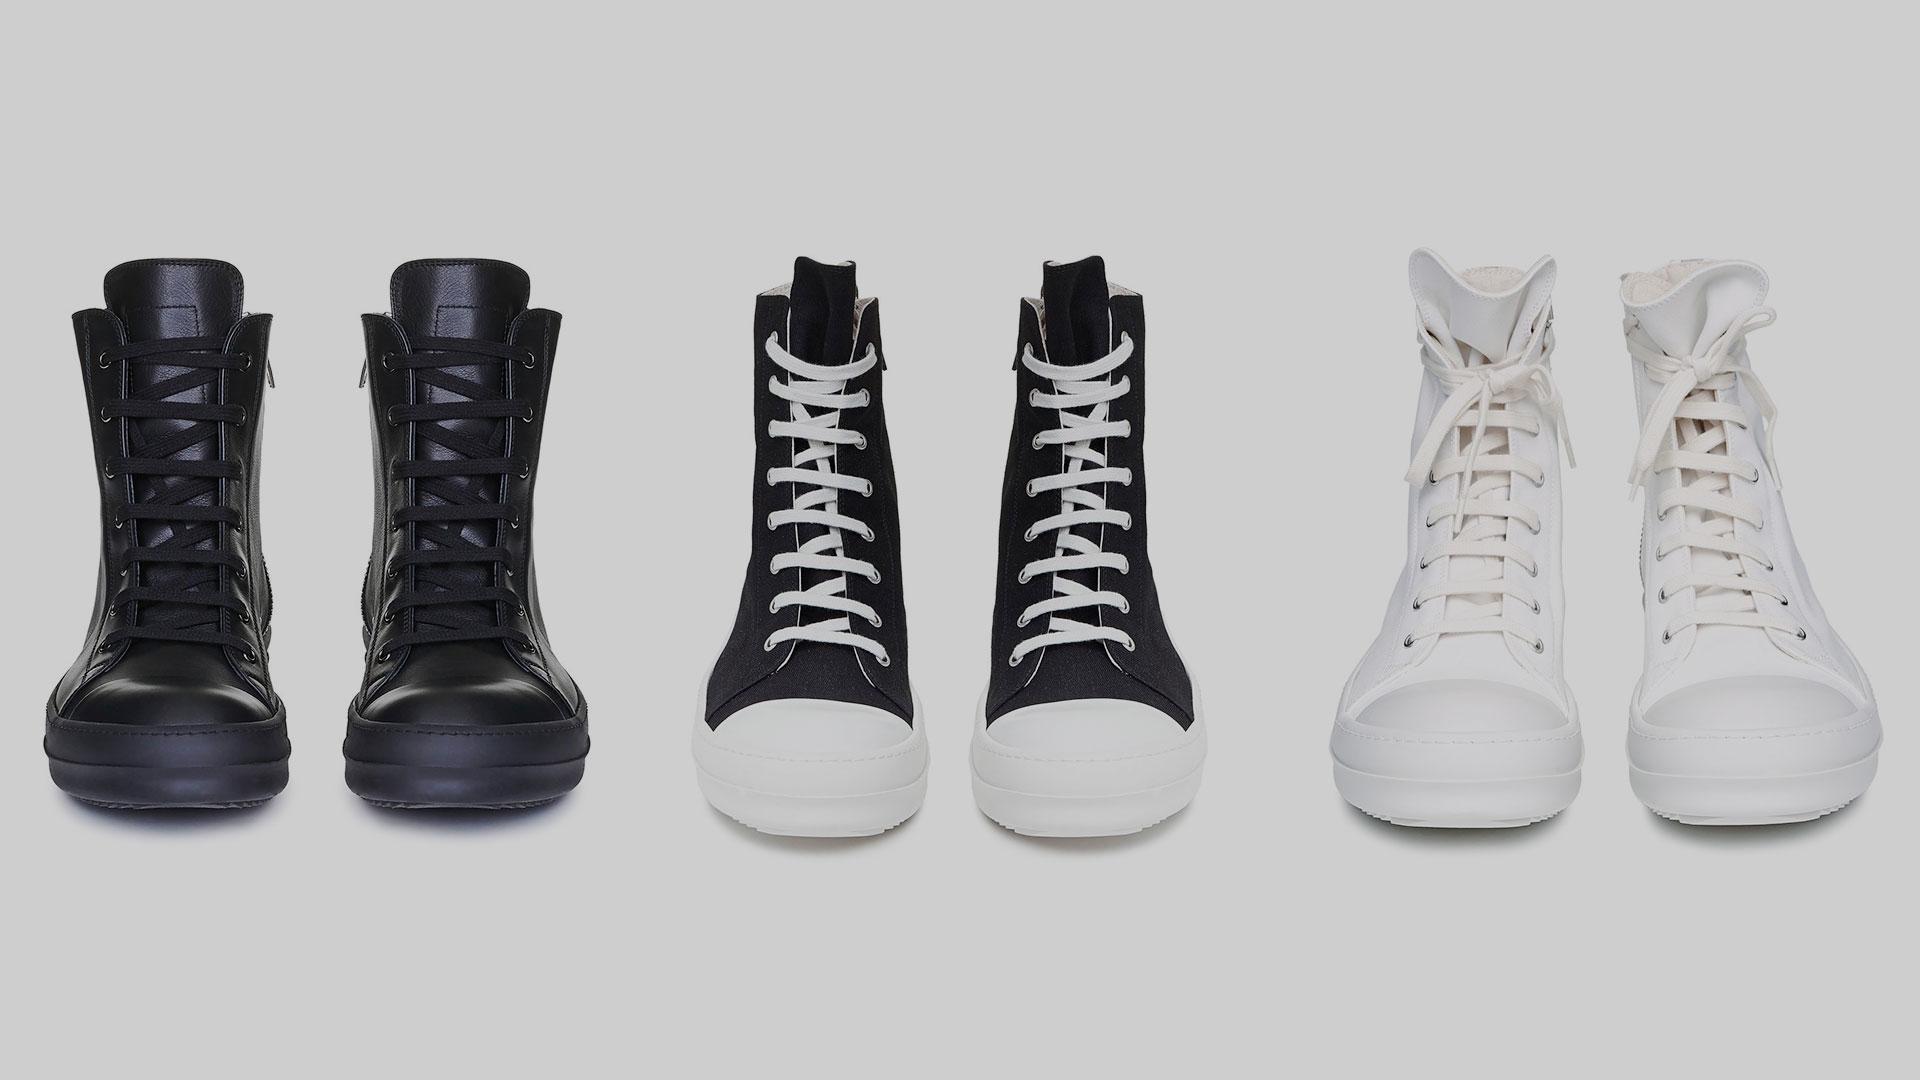 Hogyan perelte be (majdnem) a Nike Rick Owens-t